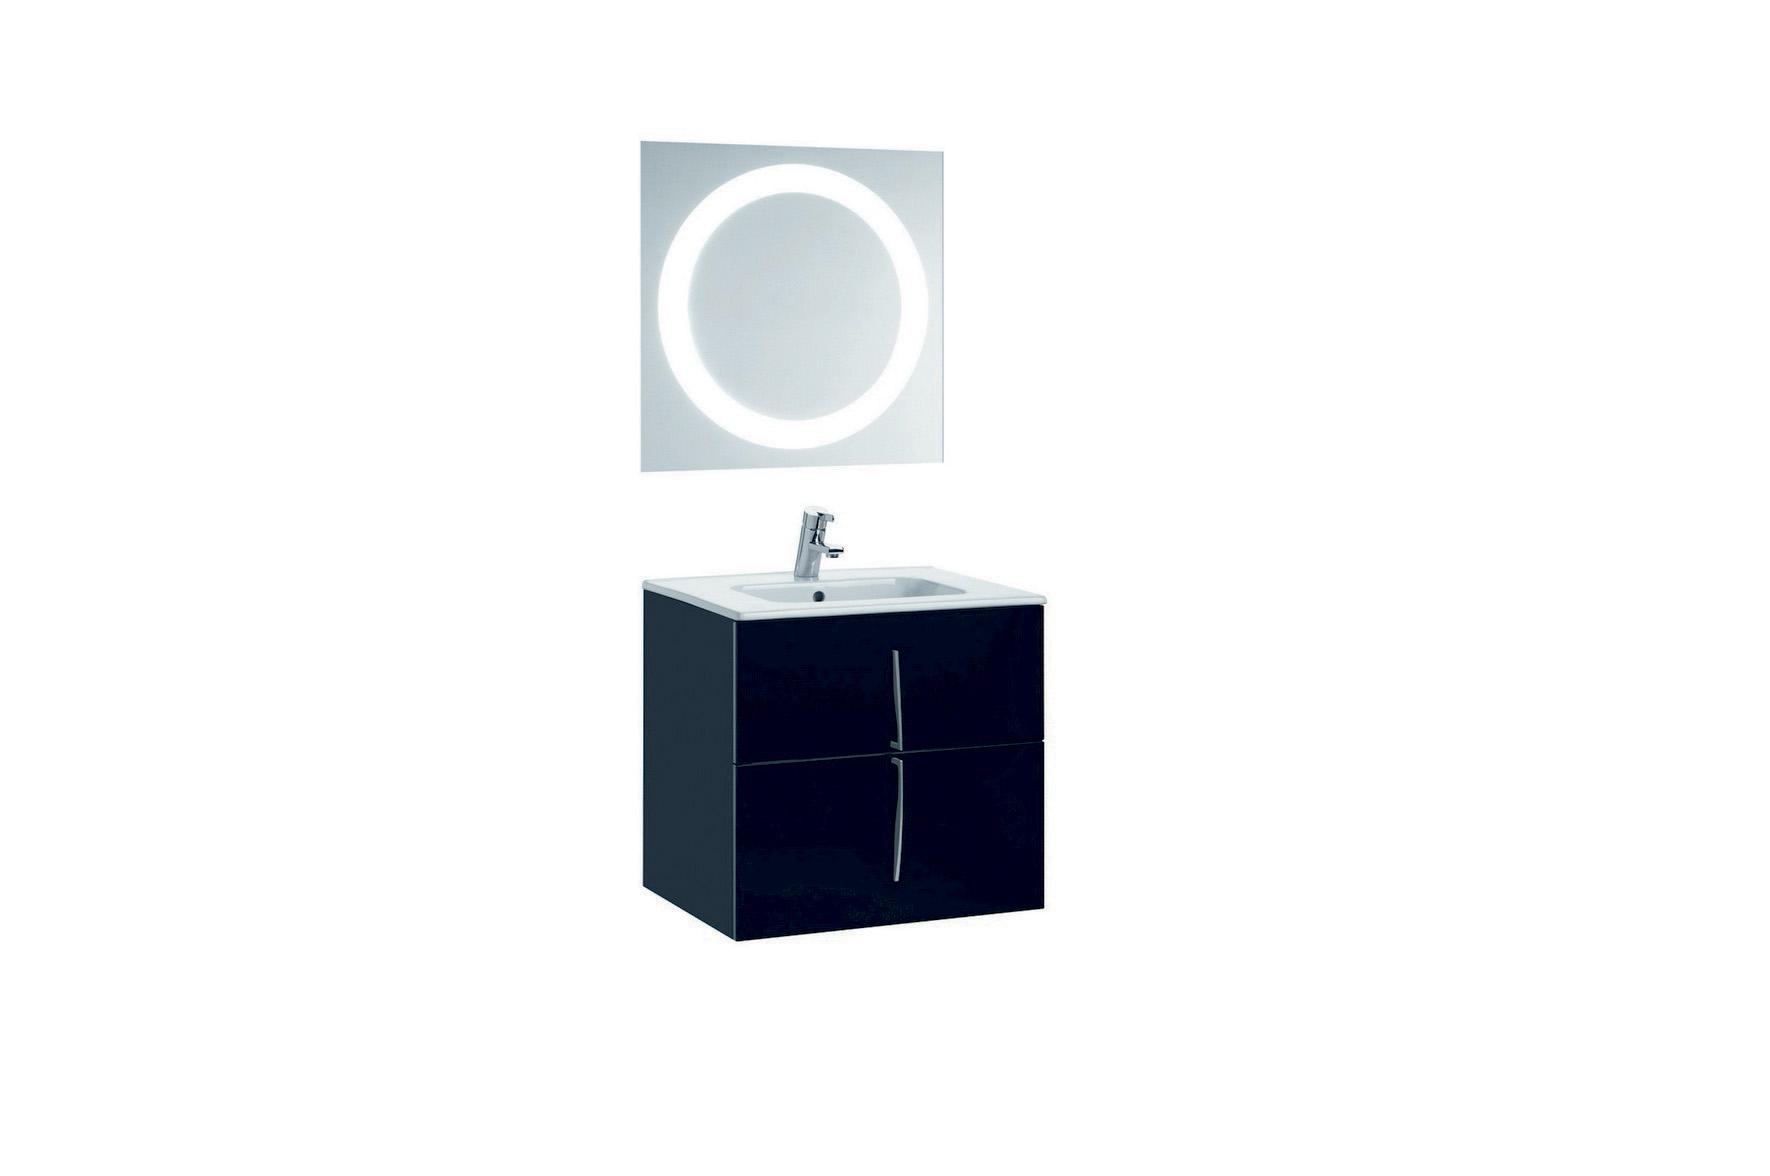 Mobilier 60 cm CUARZO 2C negru cu lavoar Smile si oglinda cu lumina rotunda GALA - Poza 6